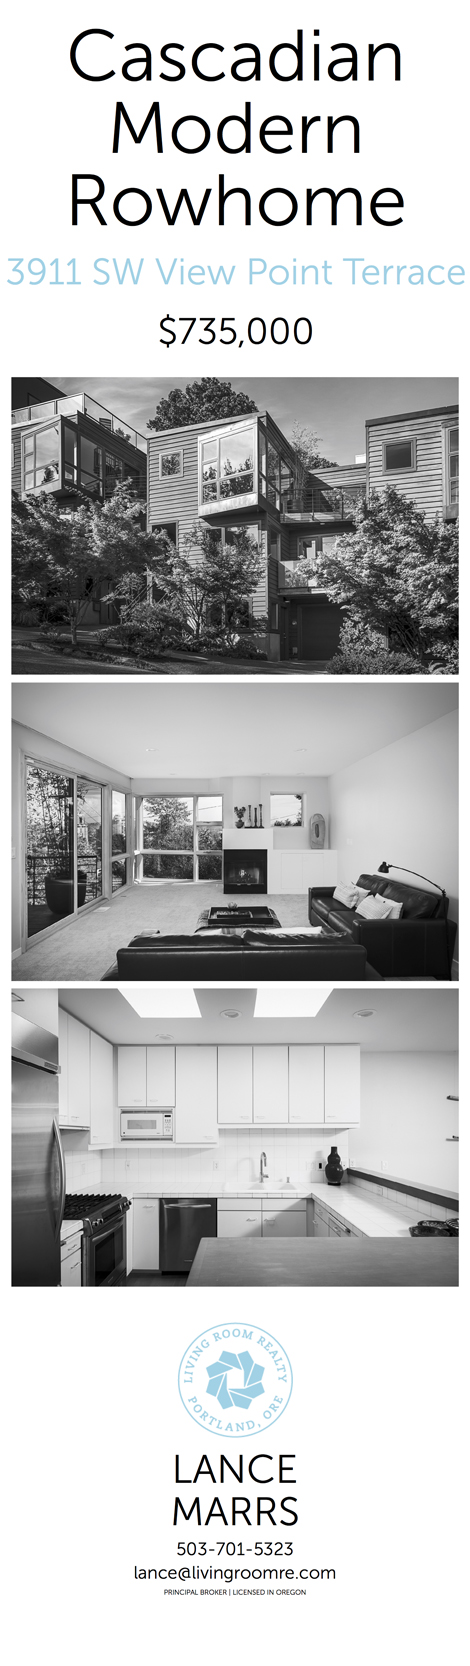 Lance_PortlandArchitecture_Ad_3911SWViewPointTer-B&W-2